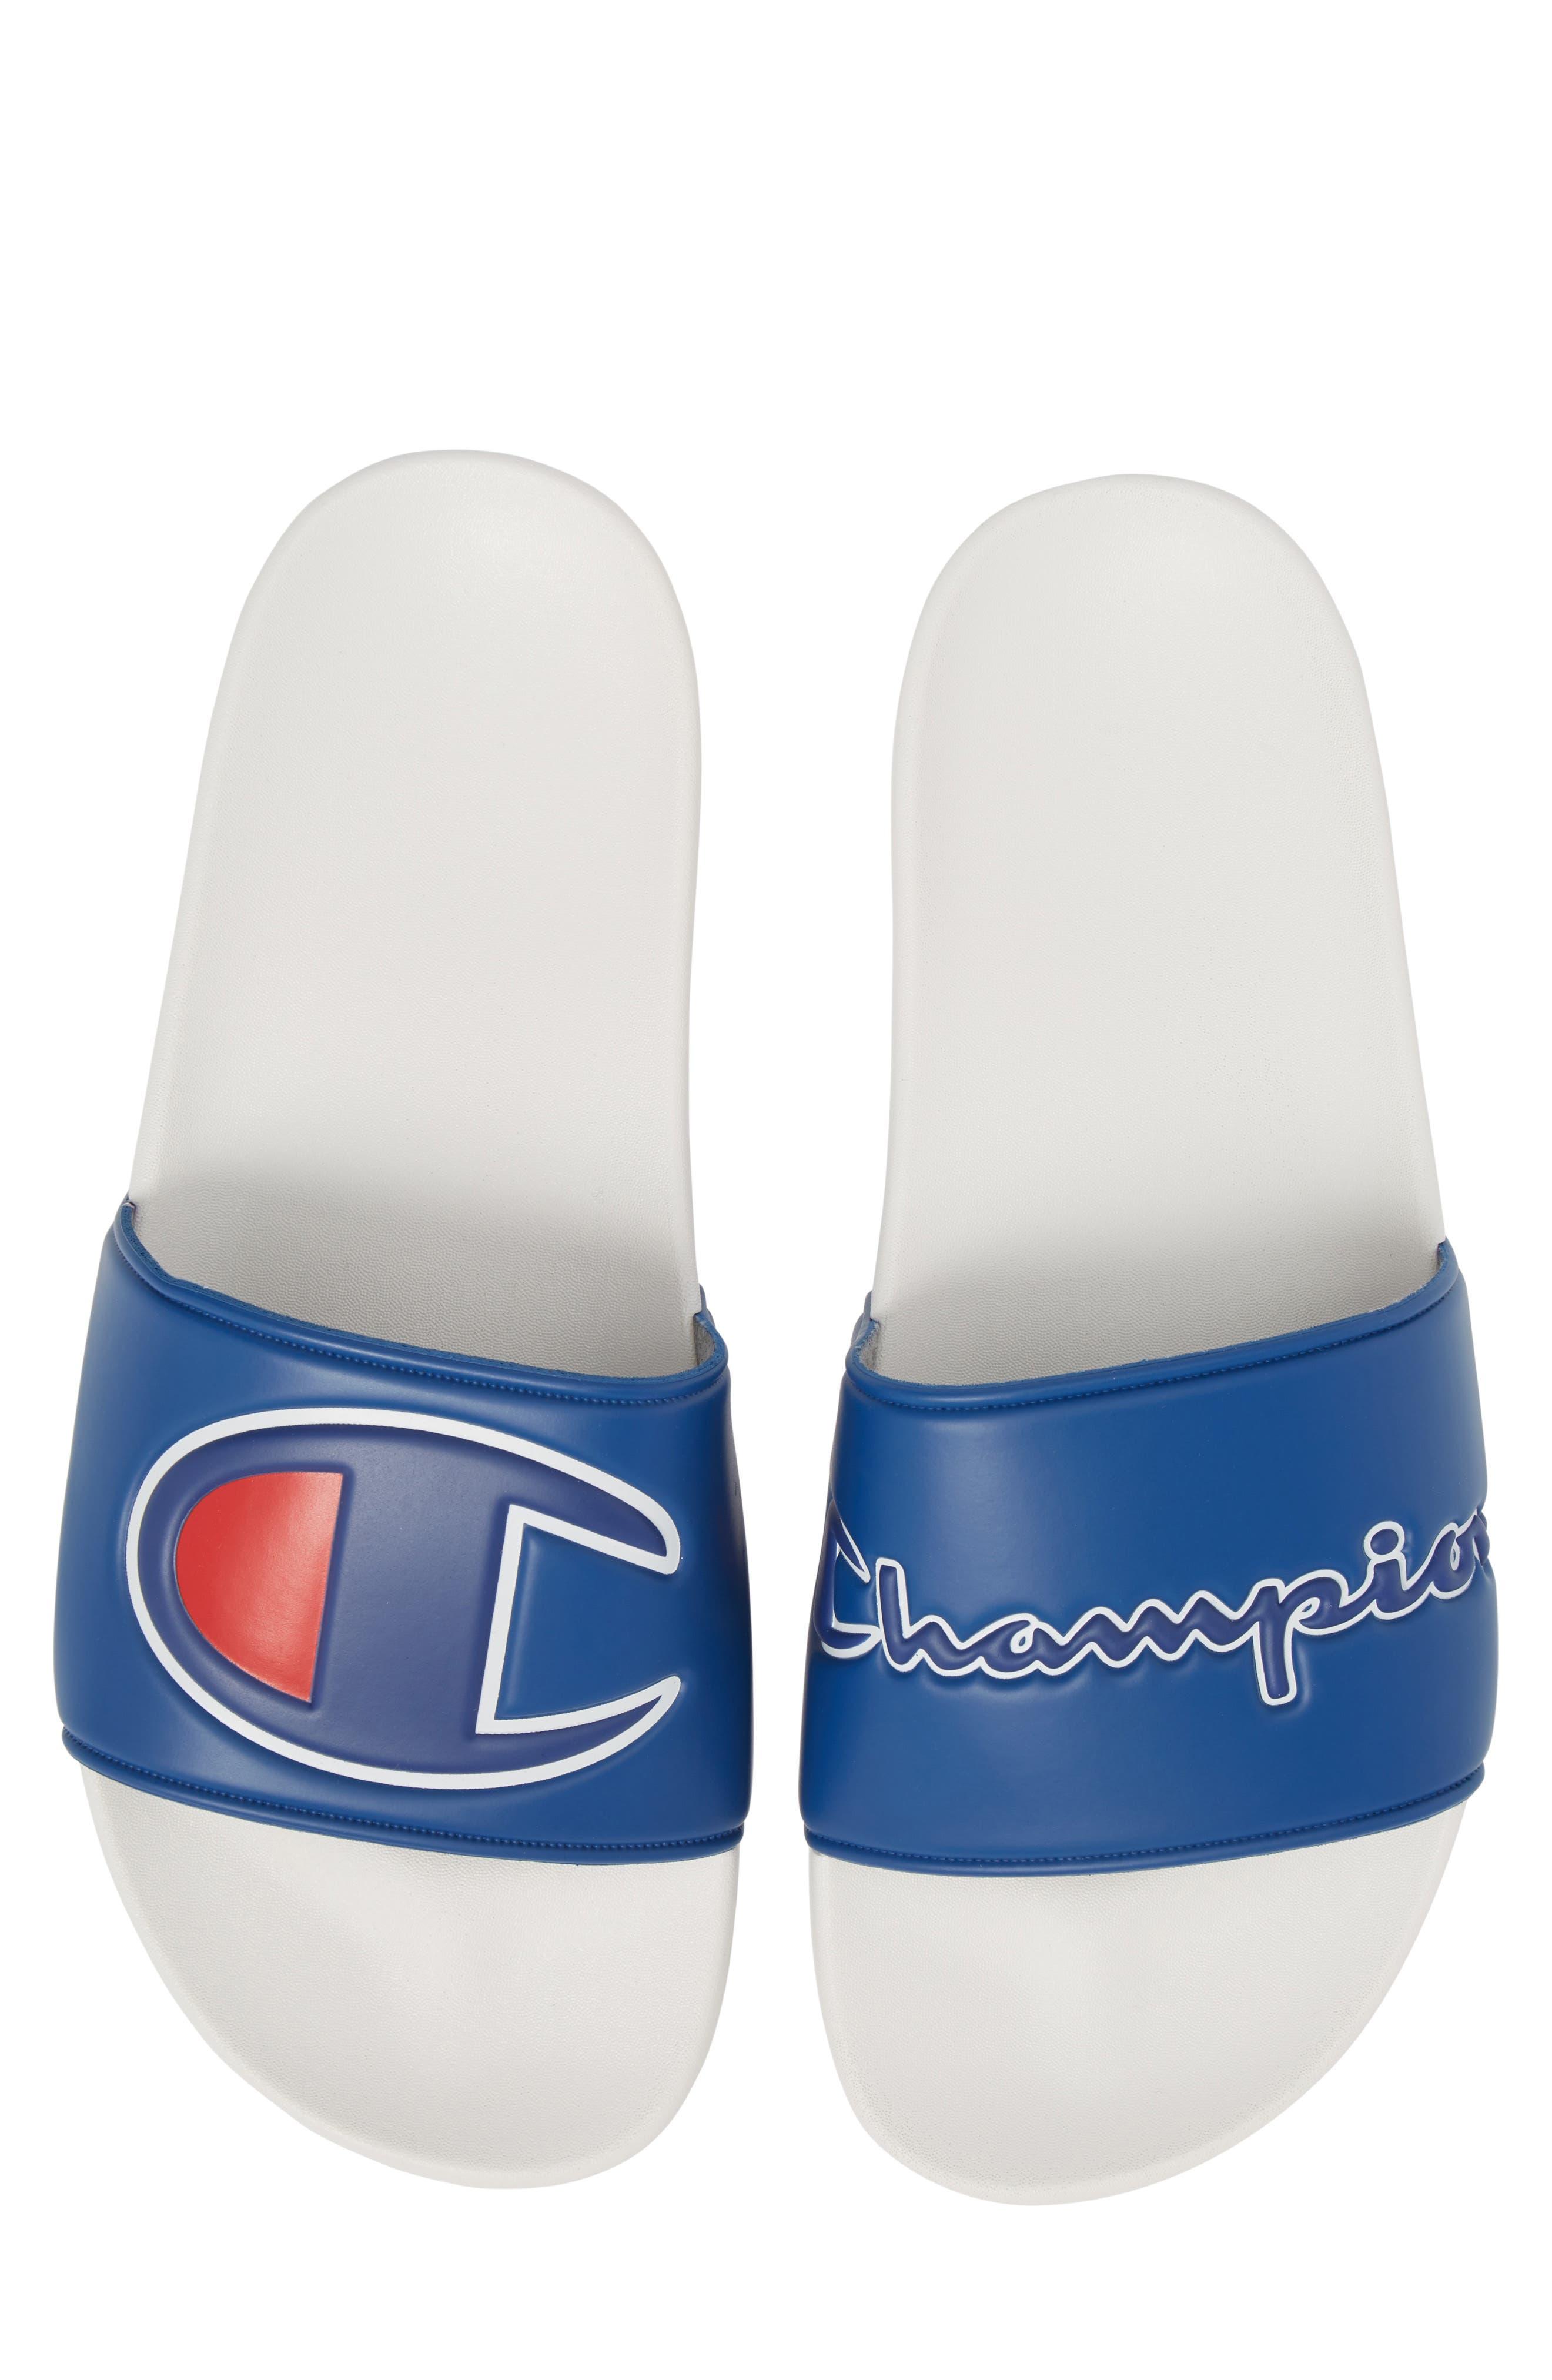 IPO Sport Slide Sandal,                         Main,                         color, Royal